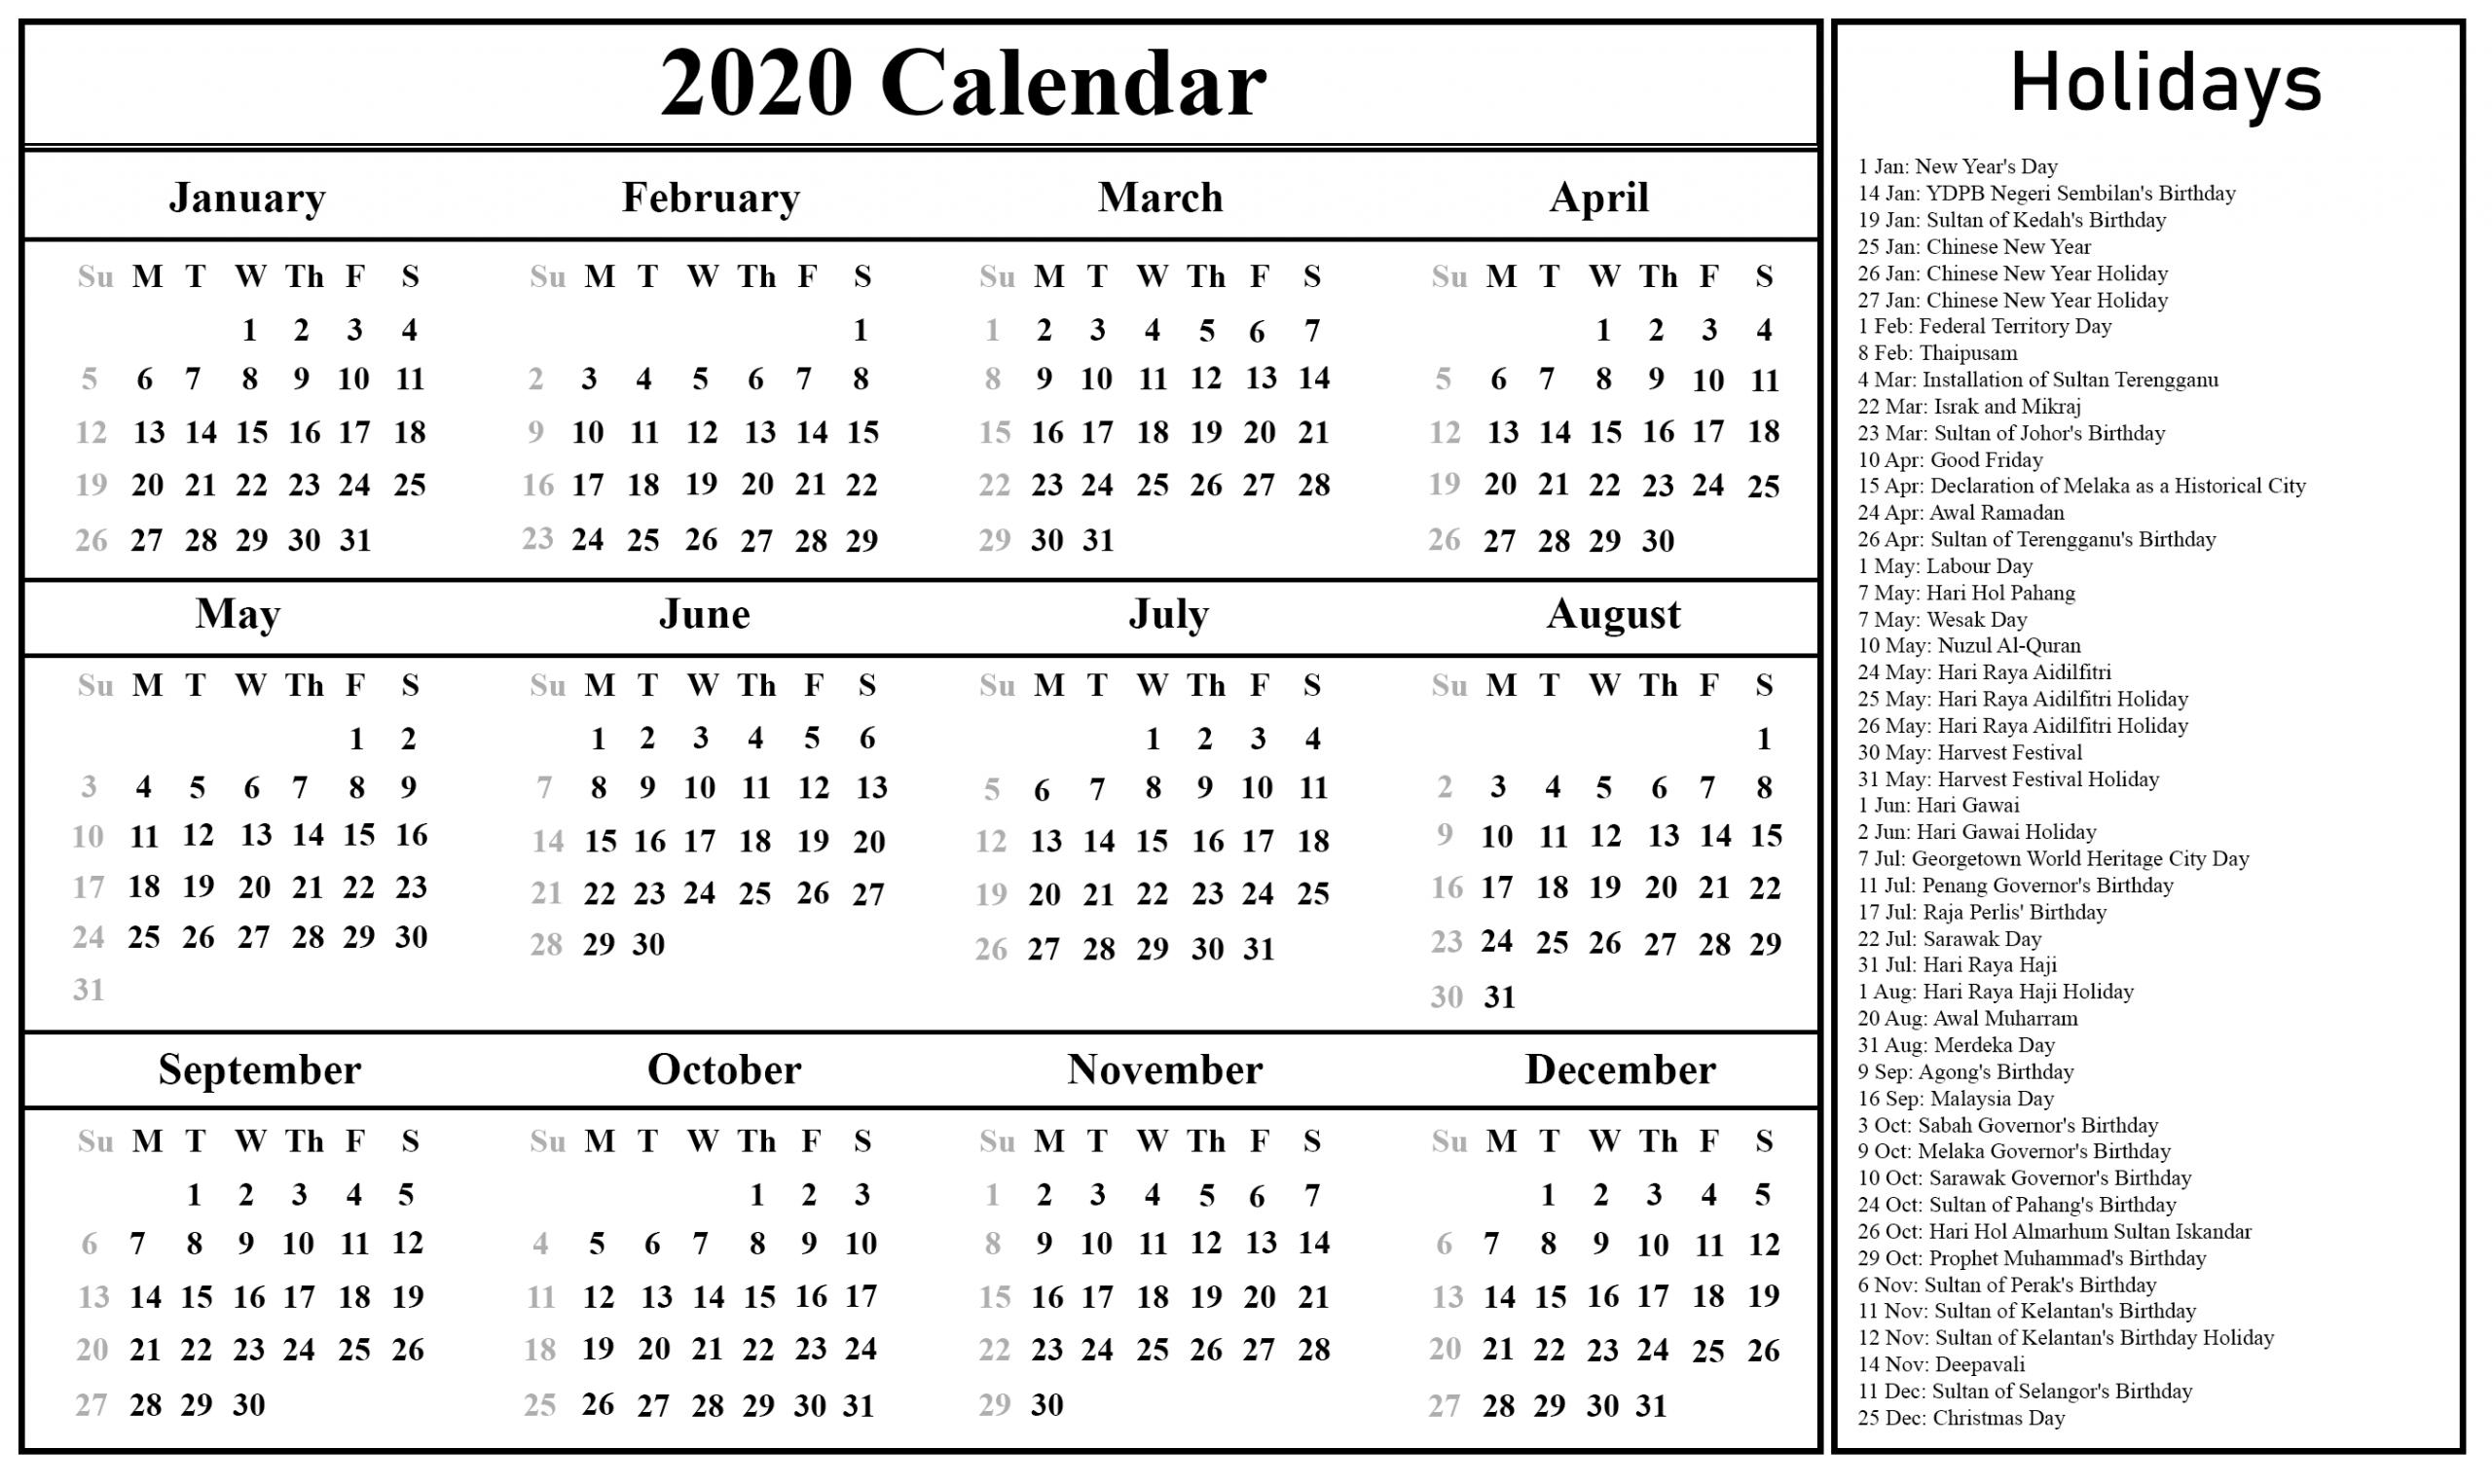 2020 Calendar With Holidays Printable - Togo.wpart.co